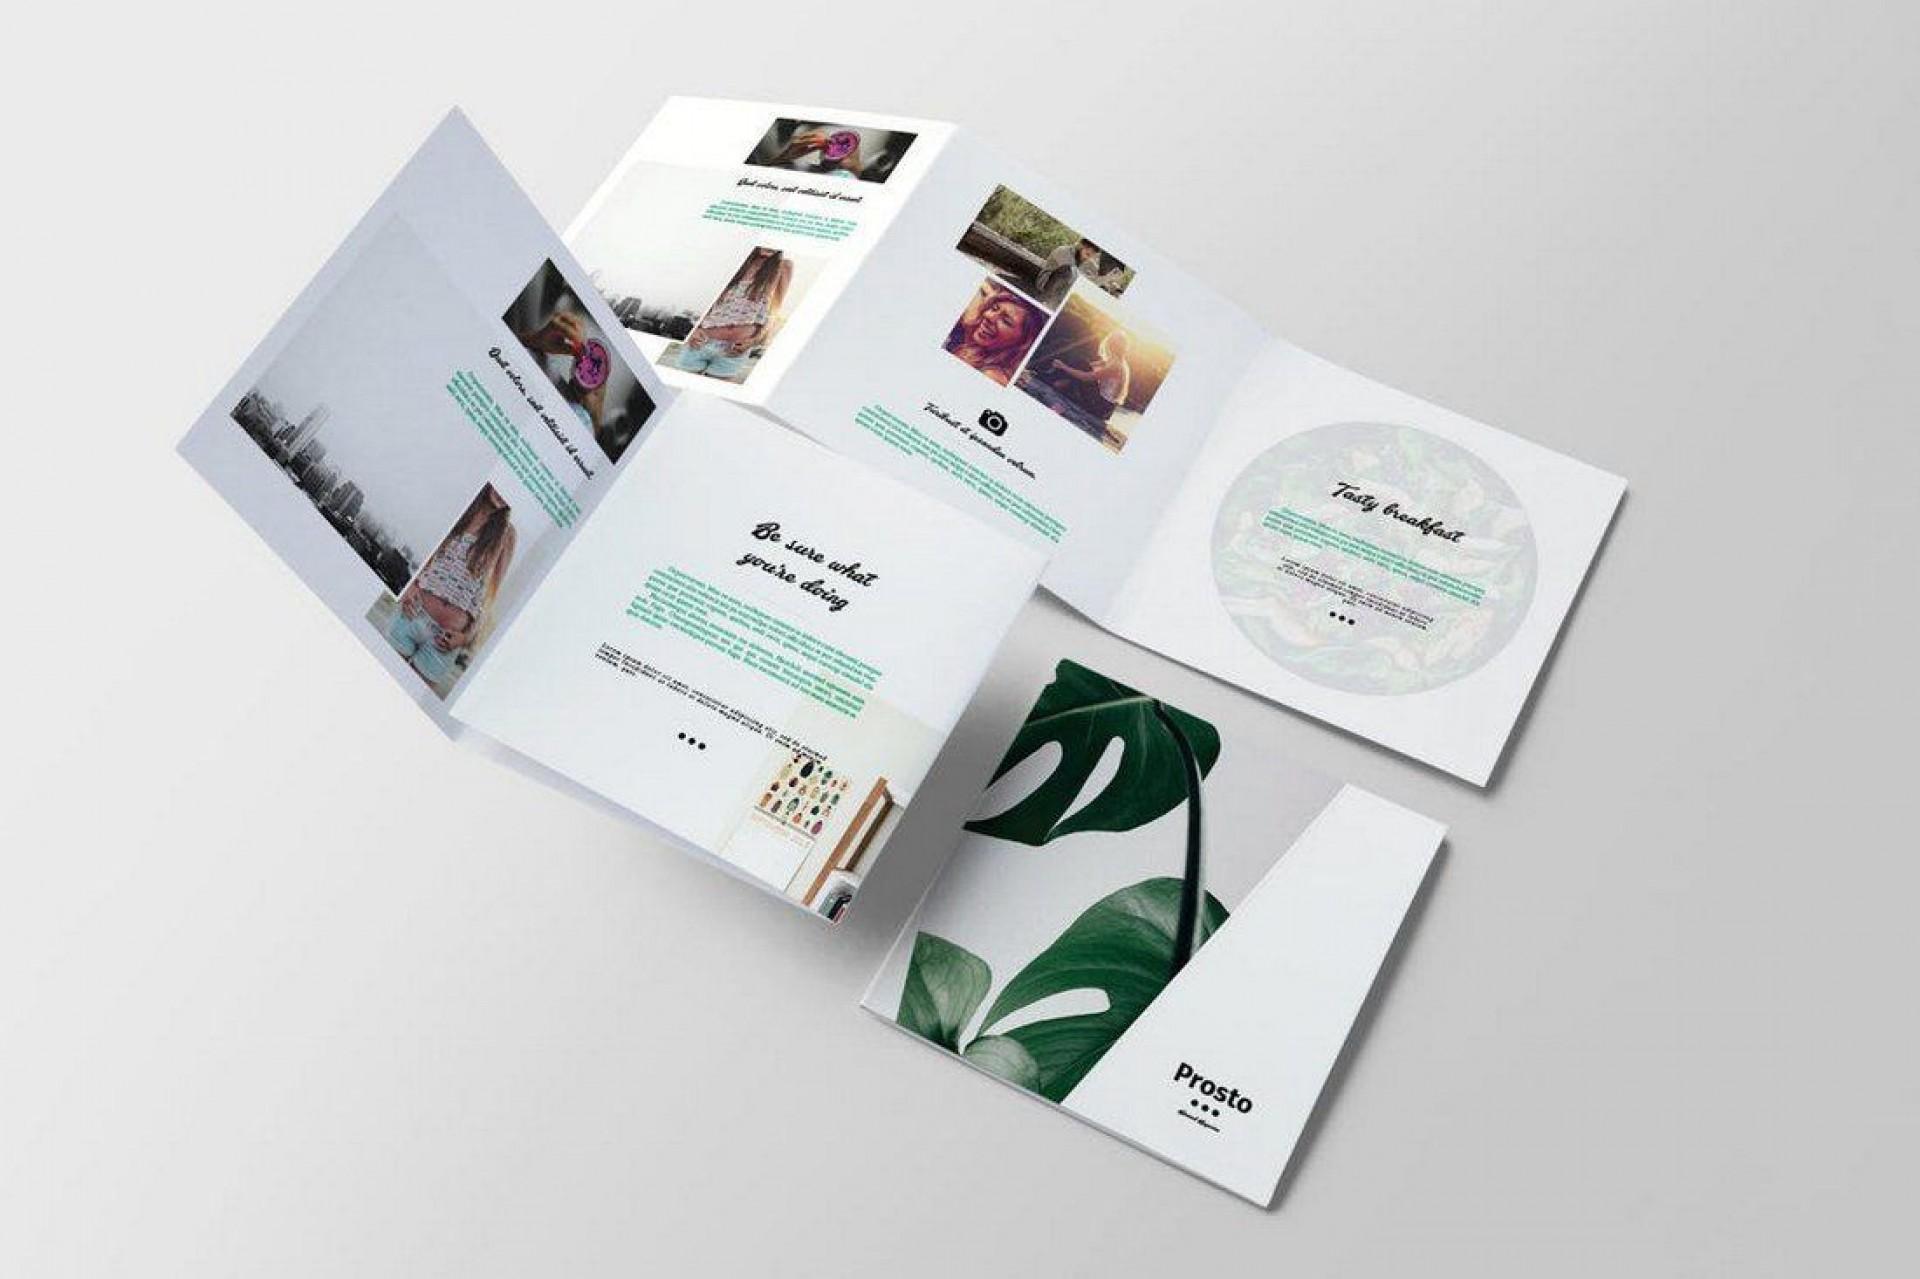 006 Beautiful Indesign Trifold Brochure Template Picture  Tri Fold A4 Bi Free Download1920